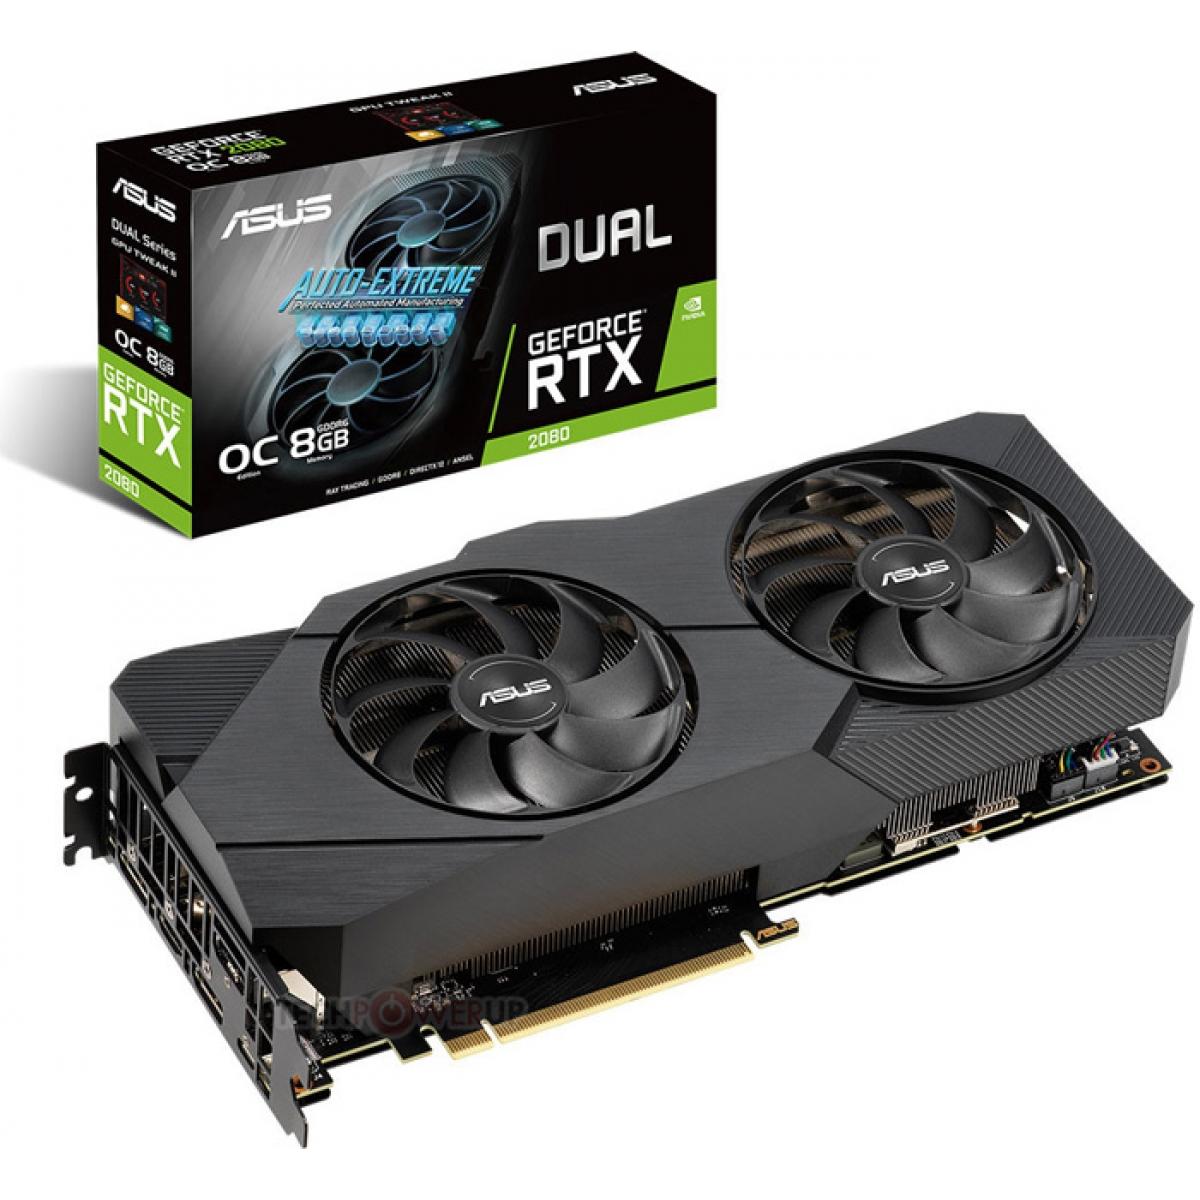 Placa de Vídeo Asus, Geforce, RTX 2080 EVO, Dual, 8GB, GDDR6, 256Bit, DUAL-RTX2080-A8G-EVO